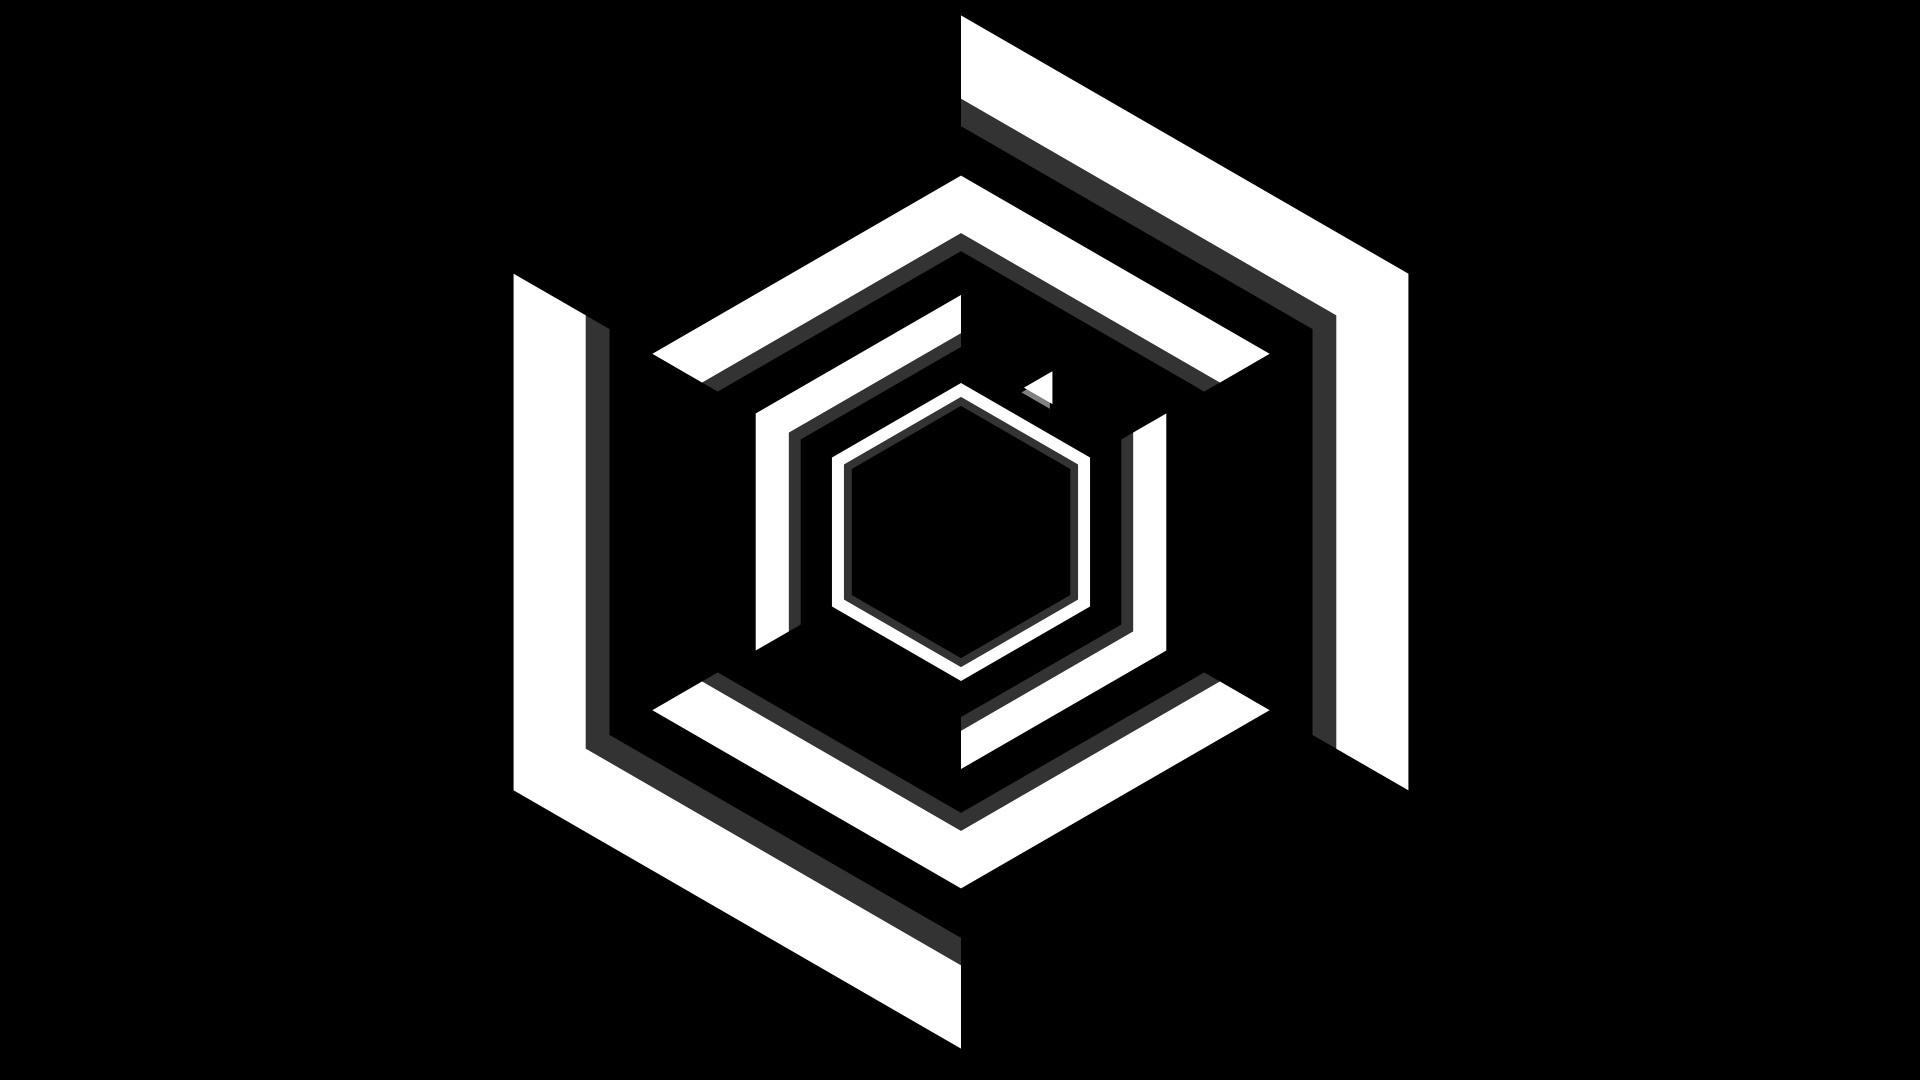 Wallpaper super hexagon, minimalism, black, white wallpapers .